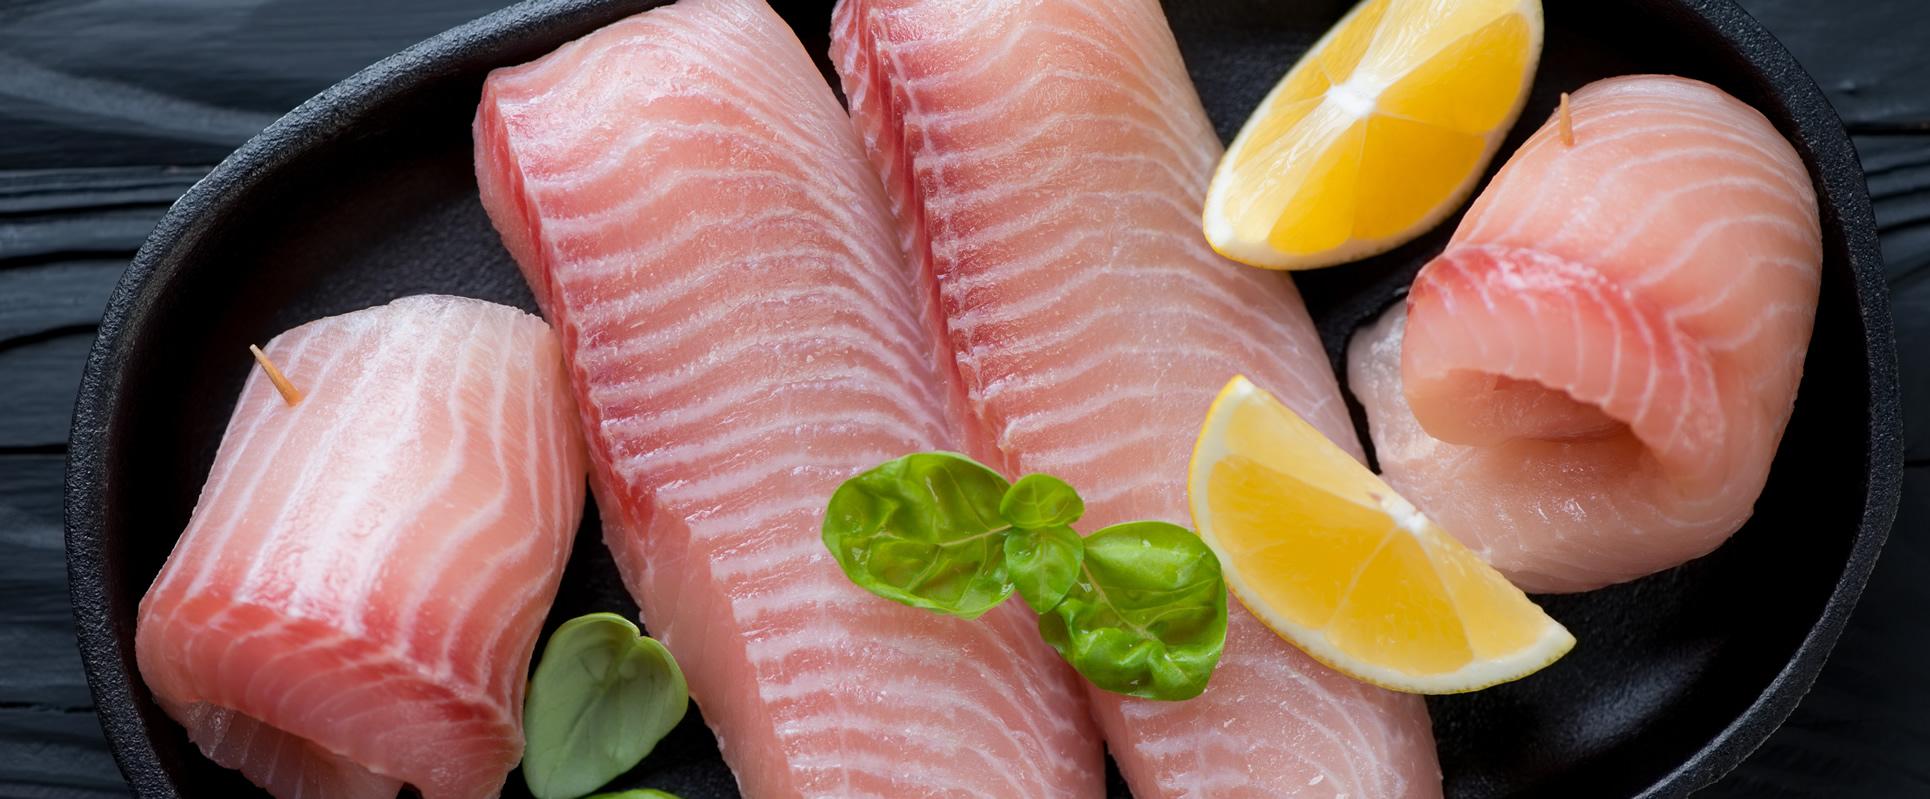 Tilapia - AquaBest Seafood